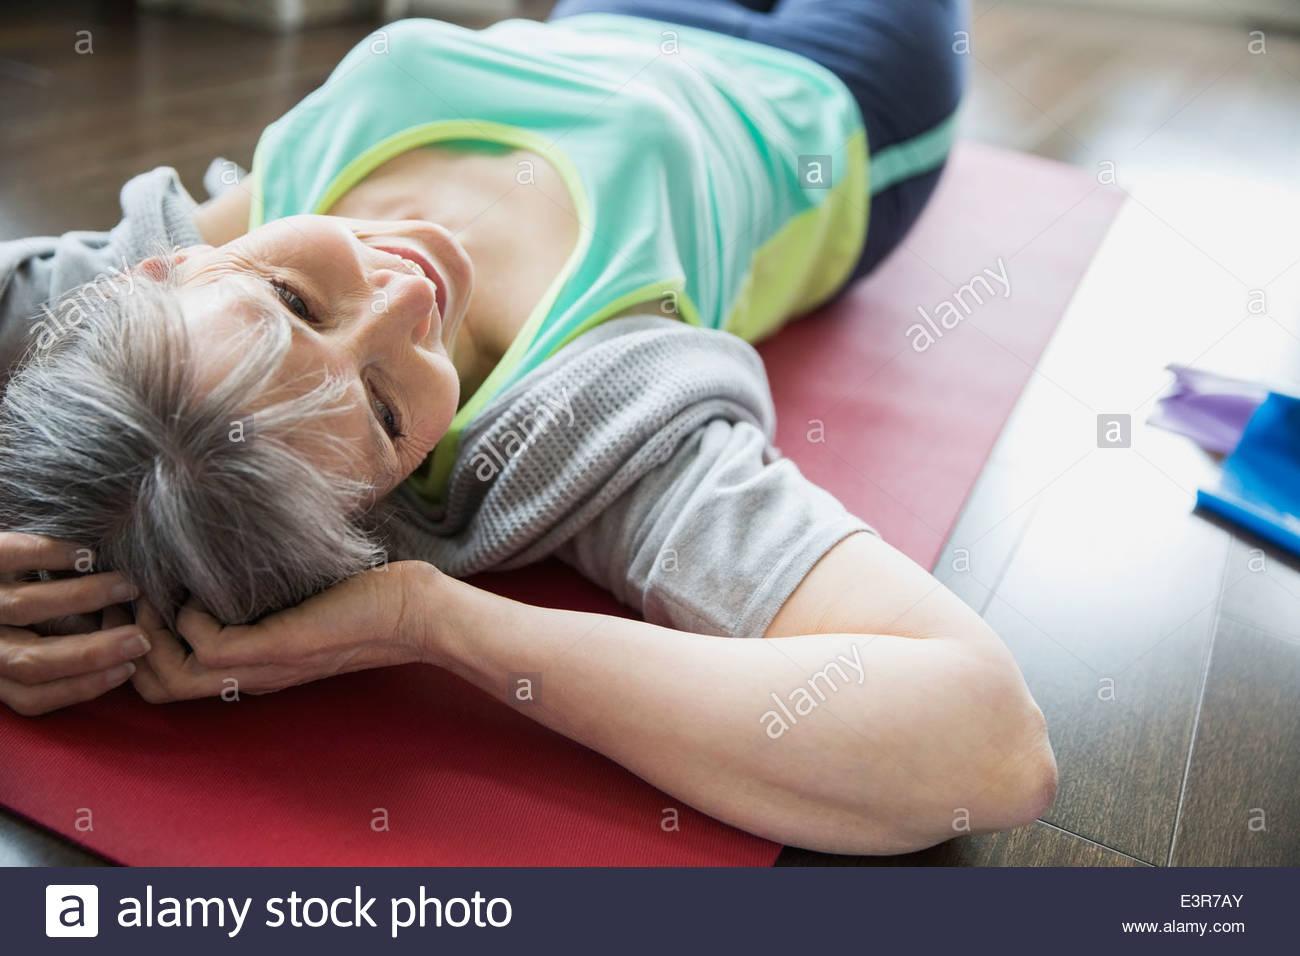 Woman laying on yoga mat - Stock Image